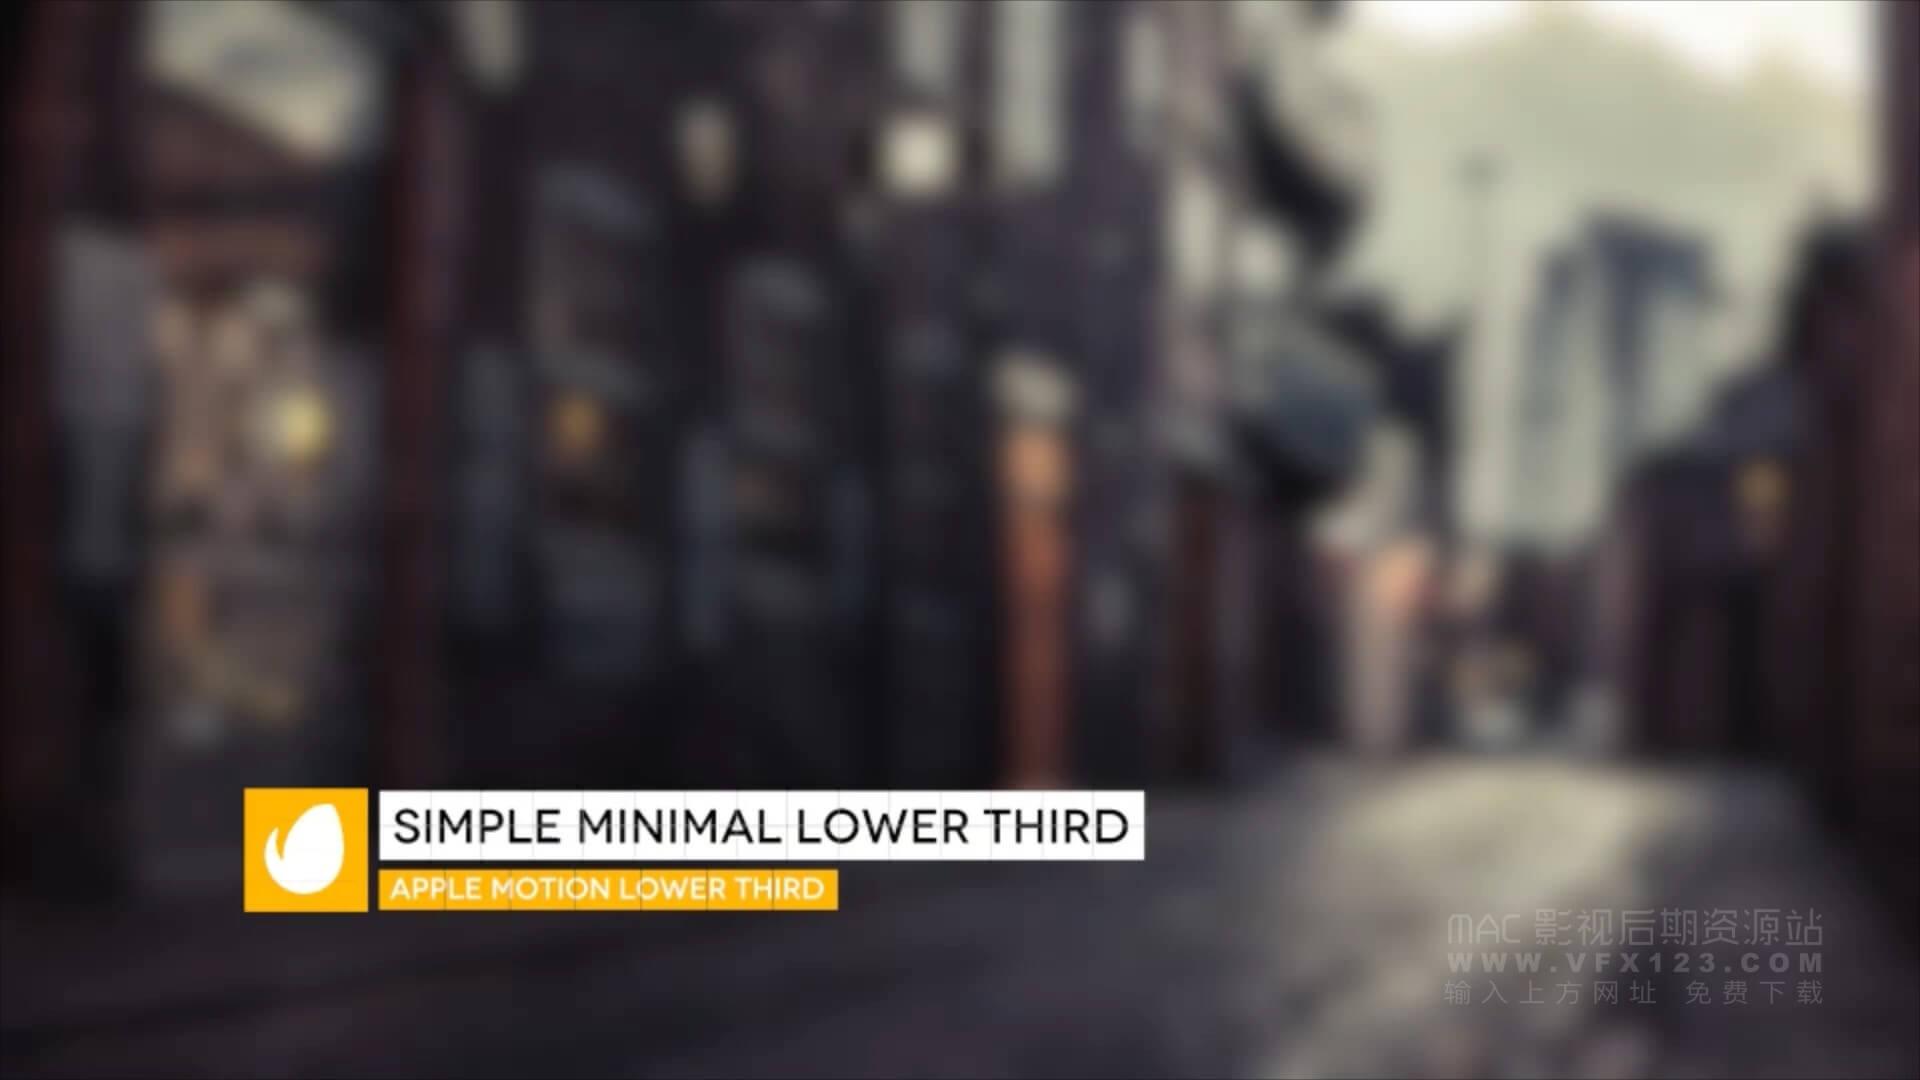 Motion模板 简单干净半透明下三分之一字幕条标题版 兼容fcpx